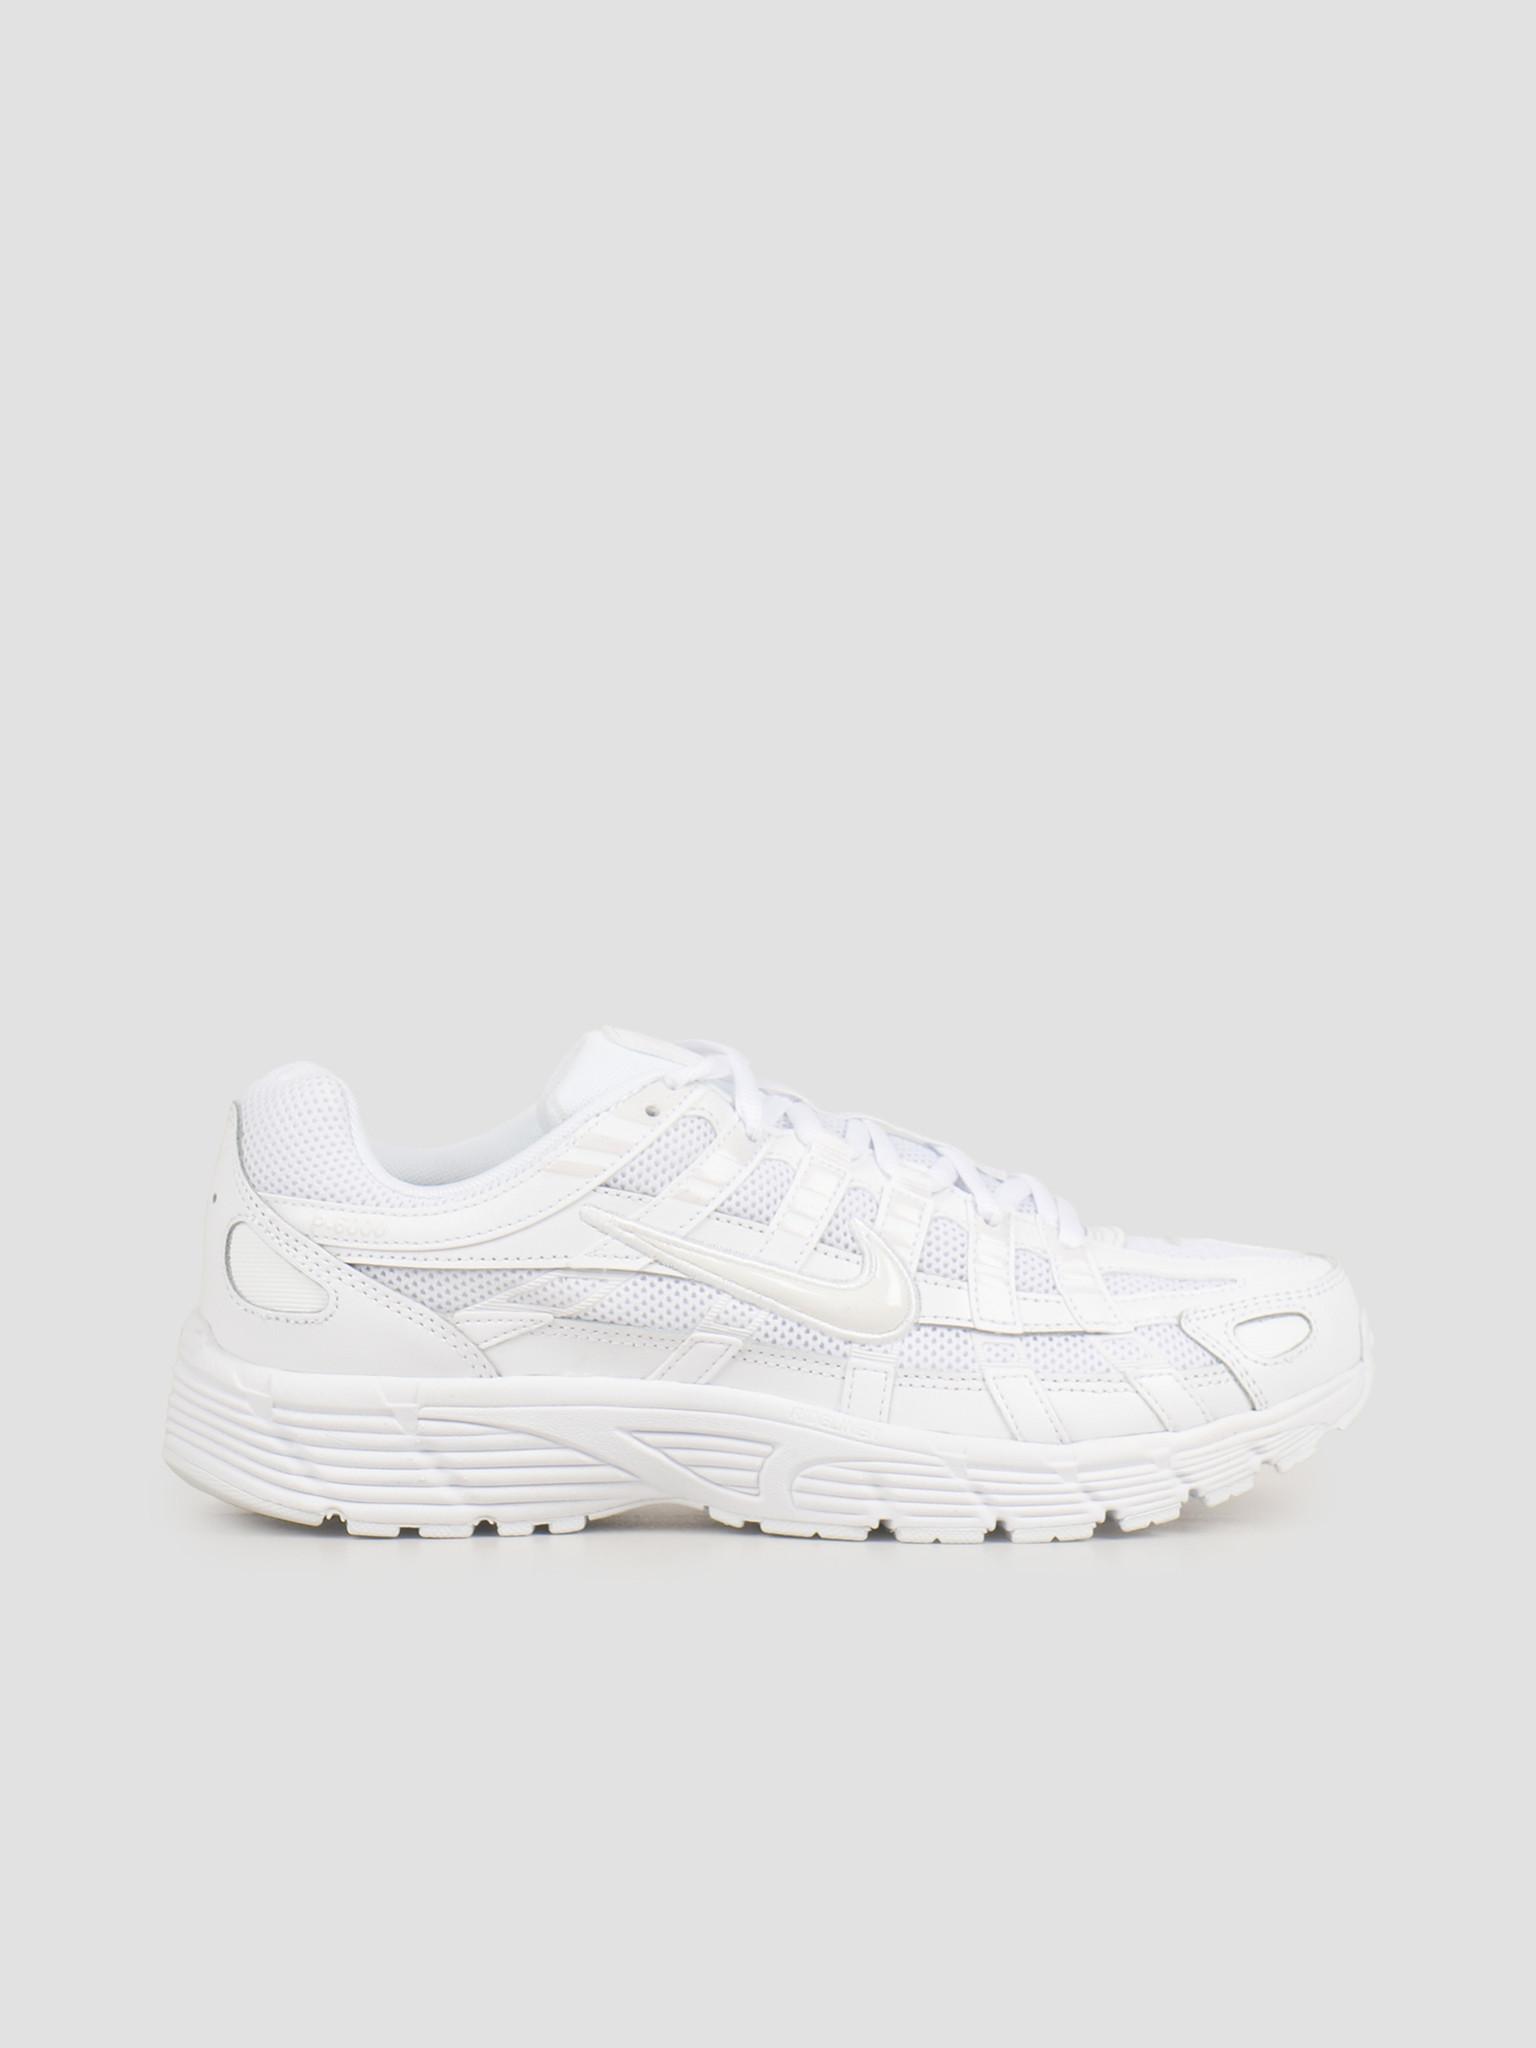 Nike Nike W Nike P 6000 White White Platinum Tint BV1021-102